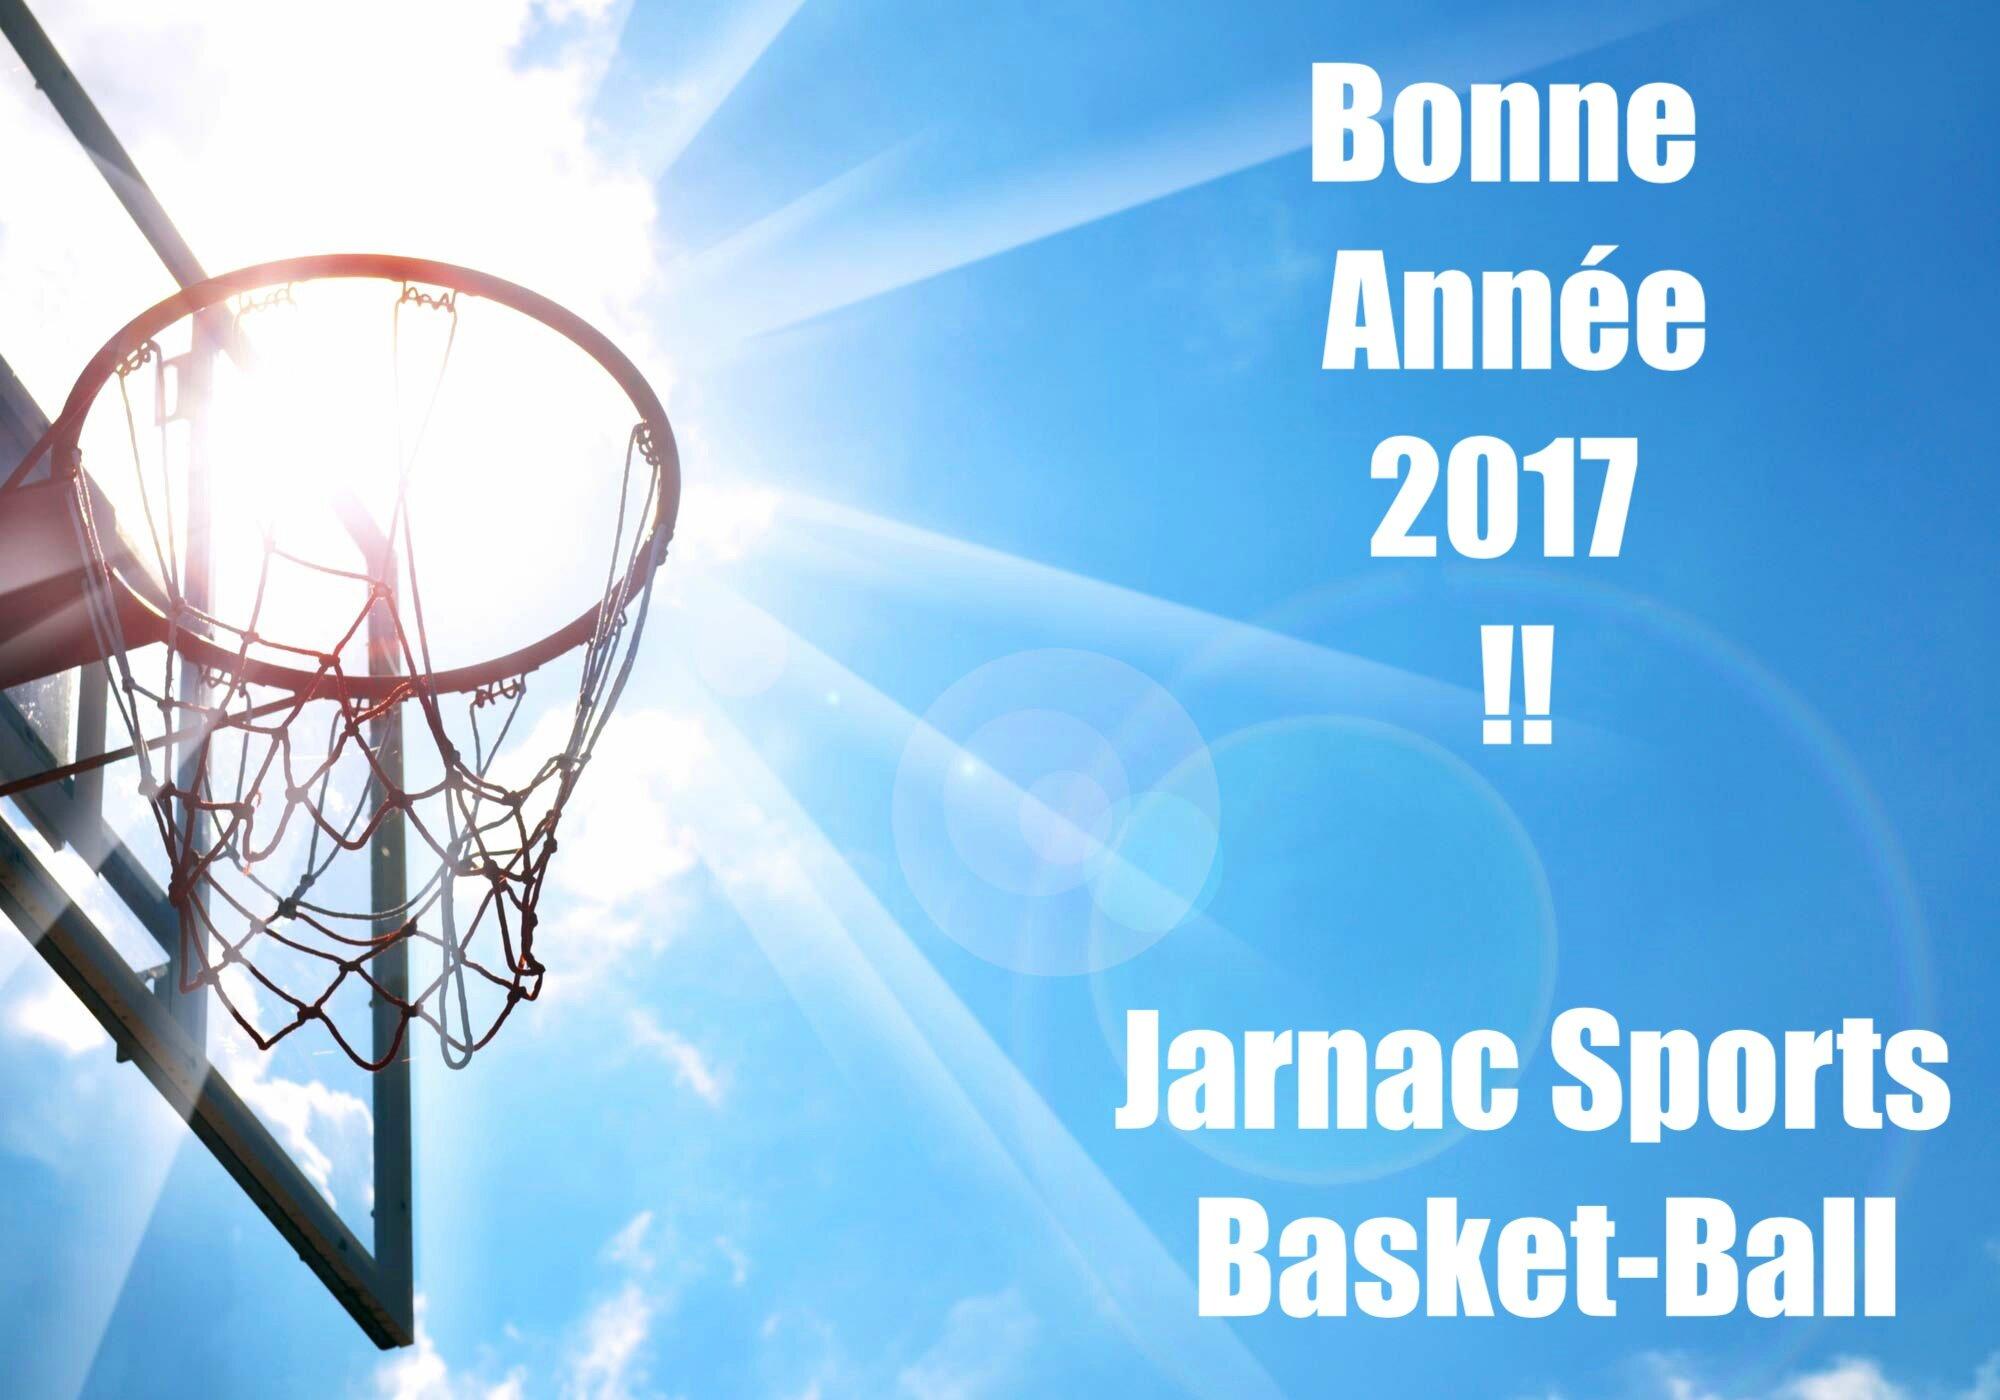 BONNE ANNEE 2017 !!!